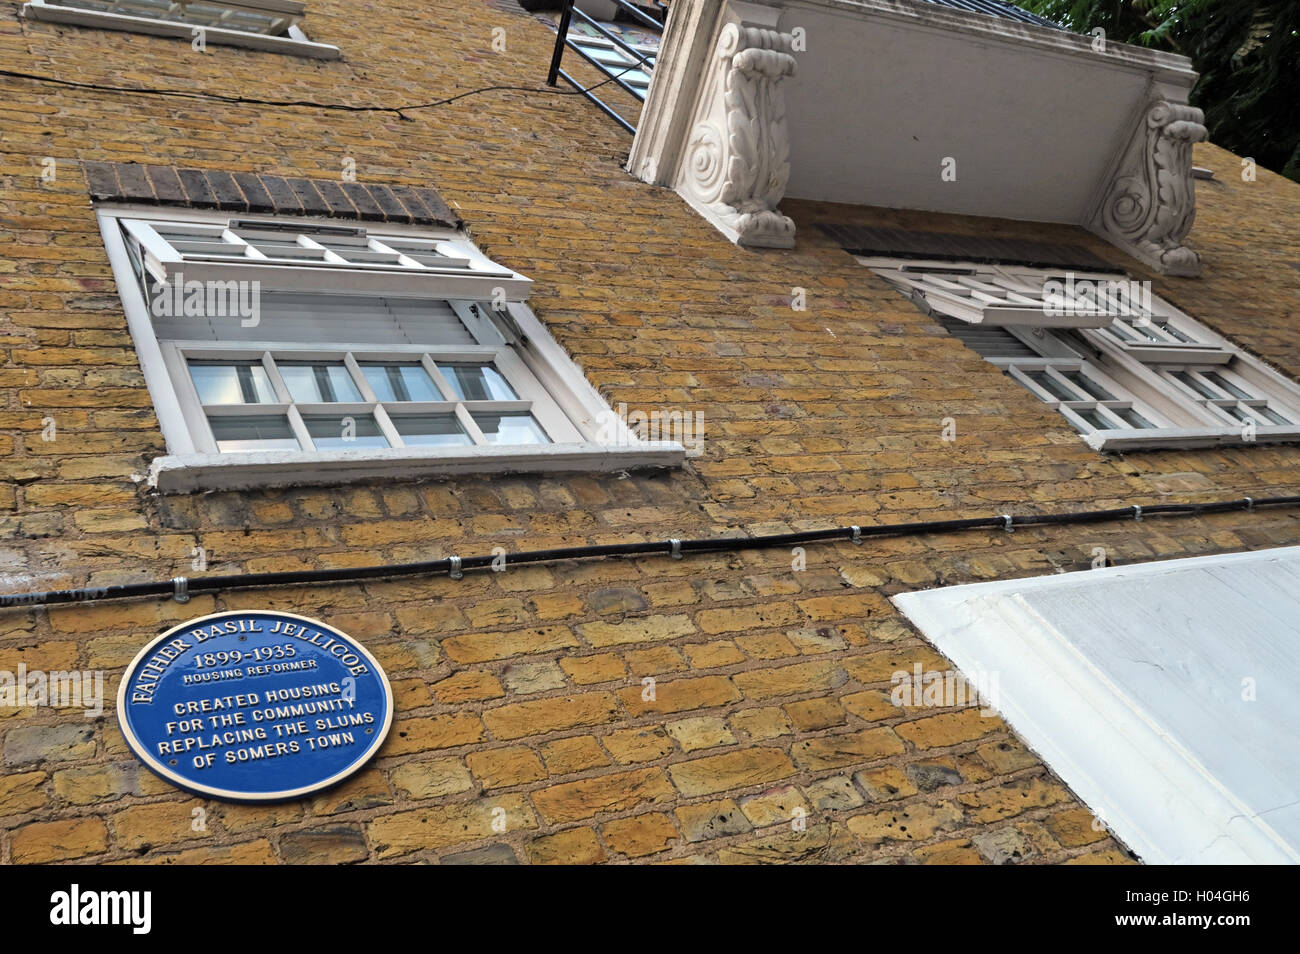 Laden Sie dieses Alamy Stockfoto Somers Town, Euston, Vater Basil Jellicoe Denkmal - H04GH6